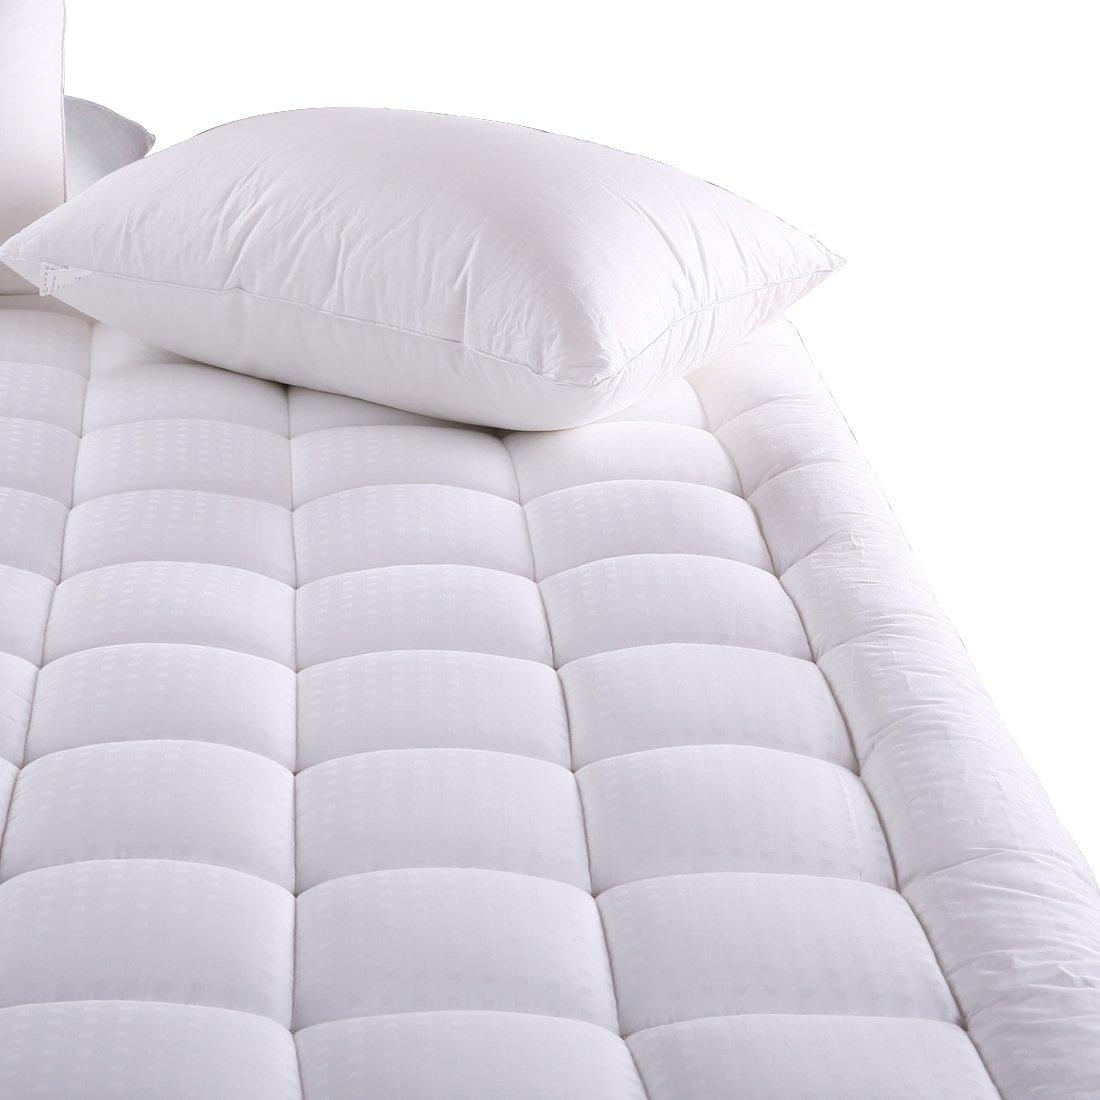 Amazon.com: MEROUS Queen Size Cotton Mattress Pad   Pillow Top